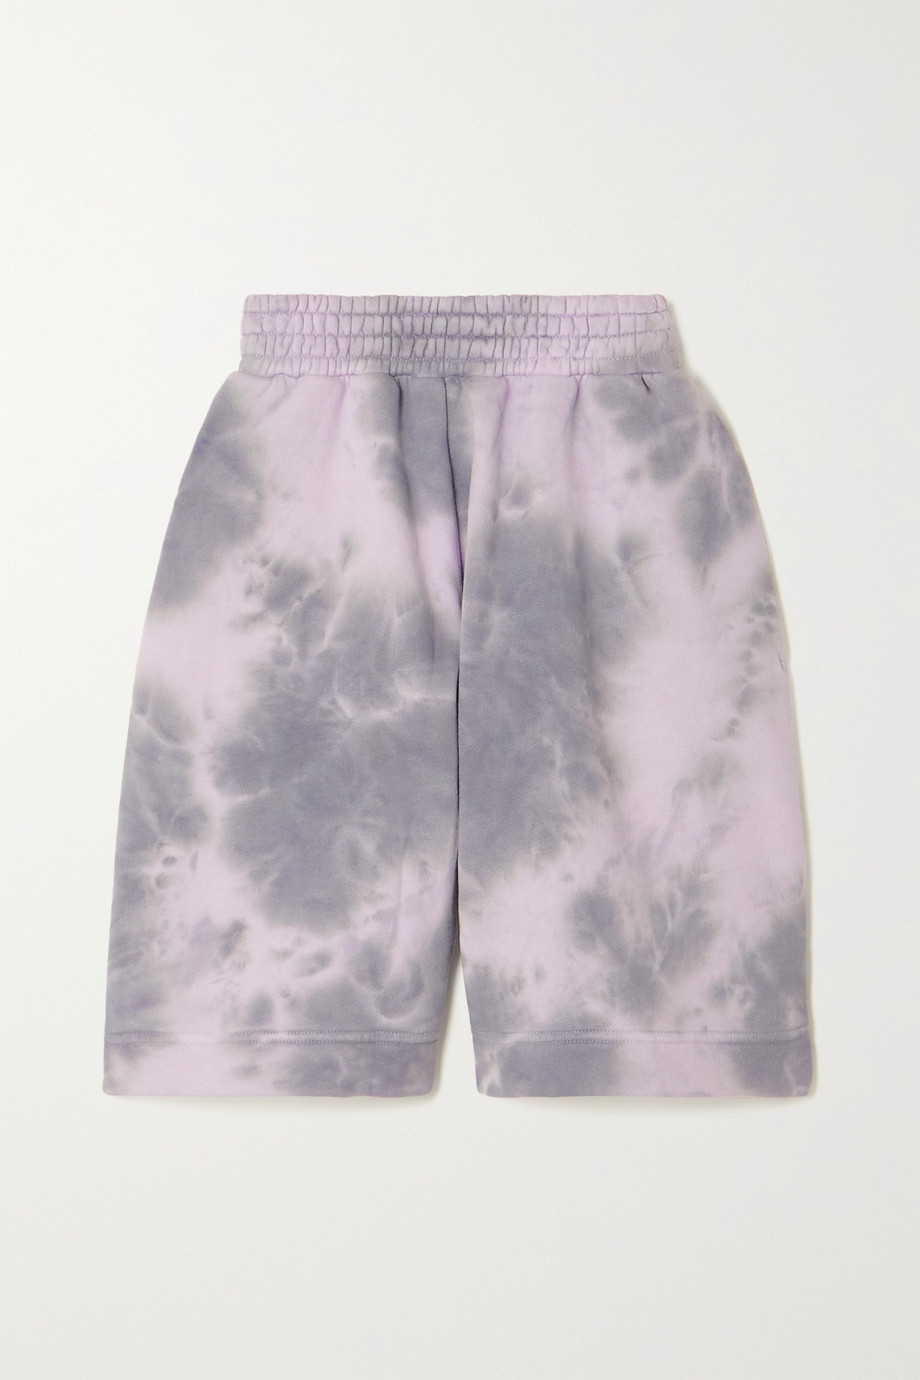 Ninety Percent + NET SUSTAIN Shorts aus Biobaumwoll-Jersey mit Batikmuster